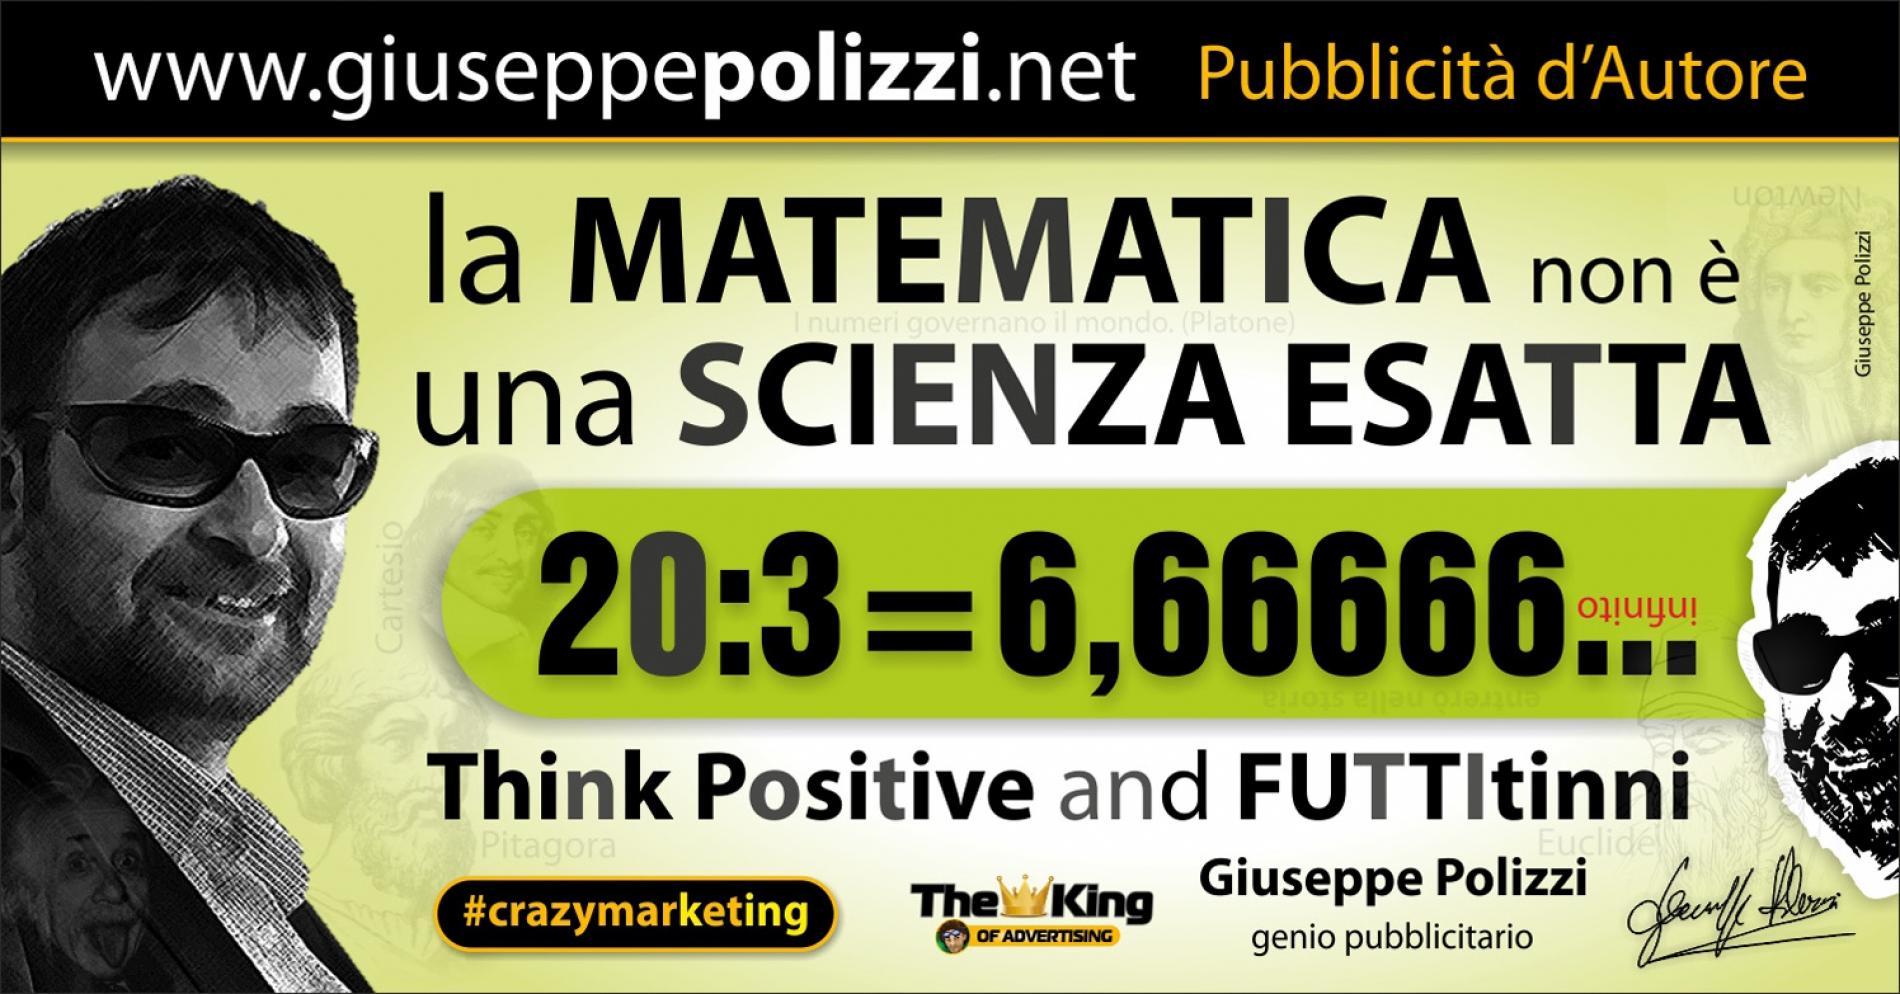 giuseppe polizzi aforismi  Matematica 2016 crazy marketing